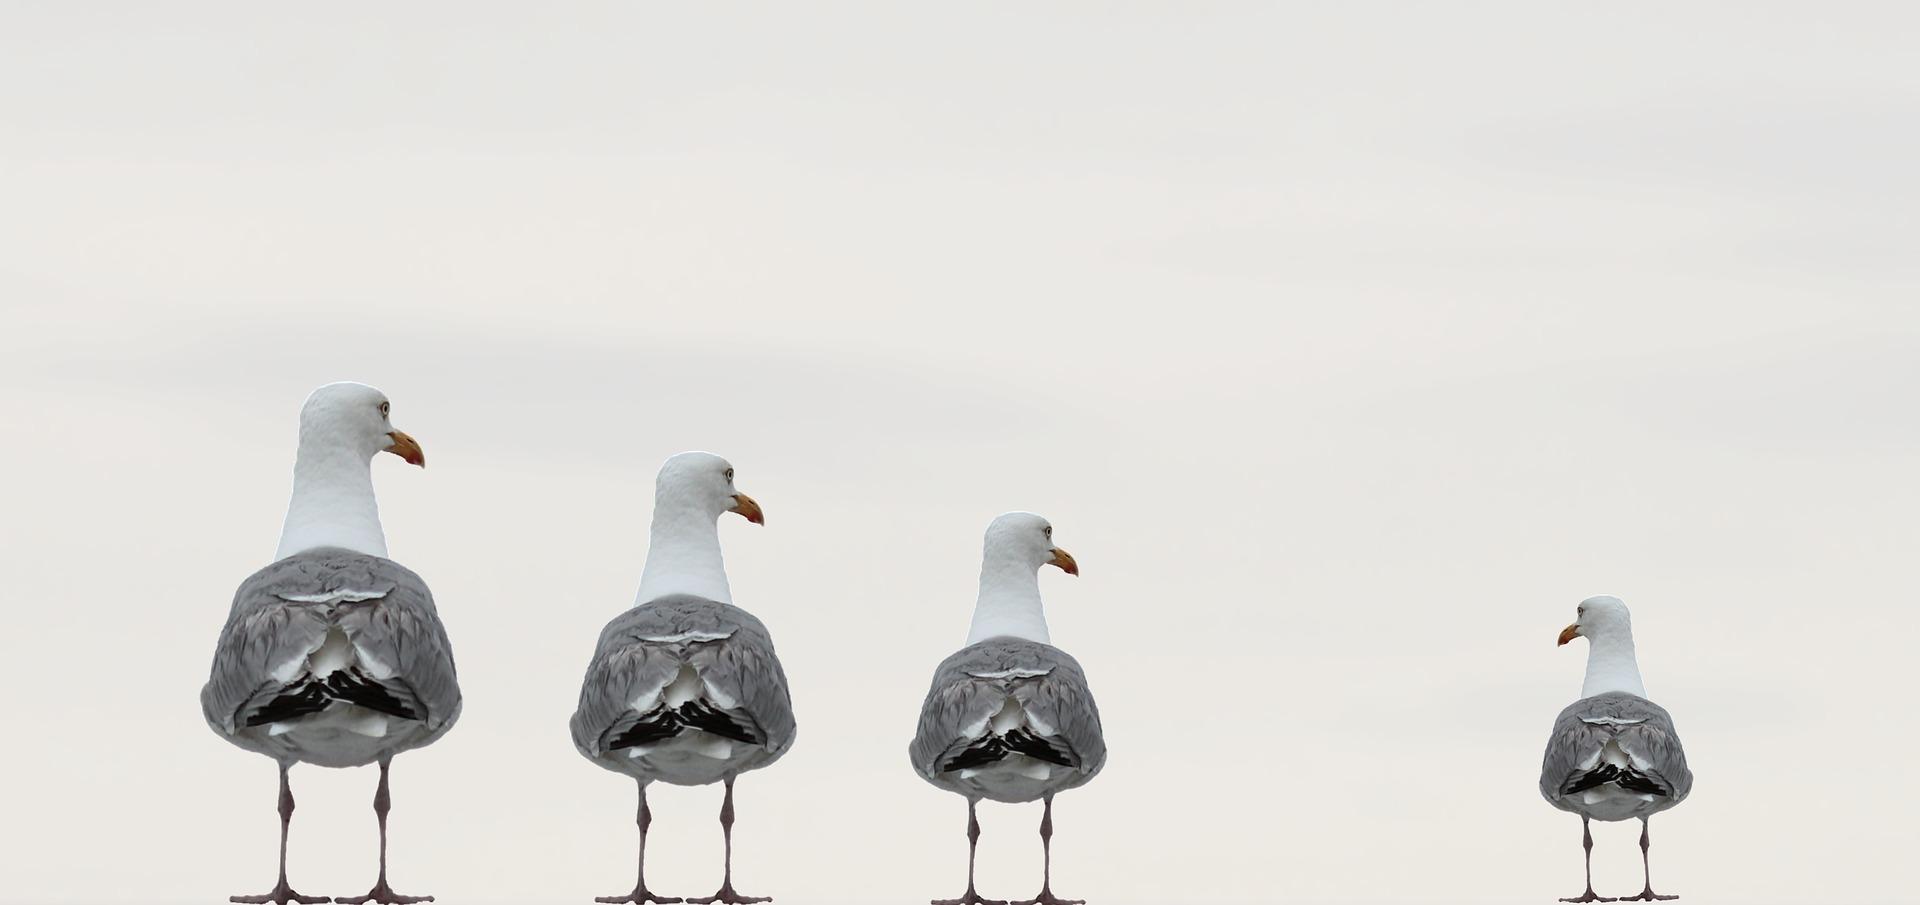 seagulls-2662550_1920